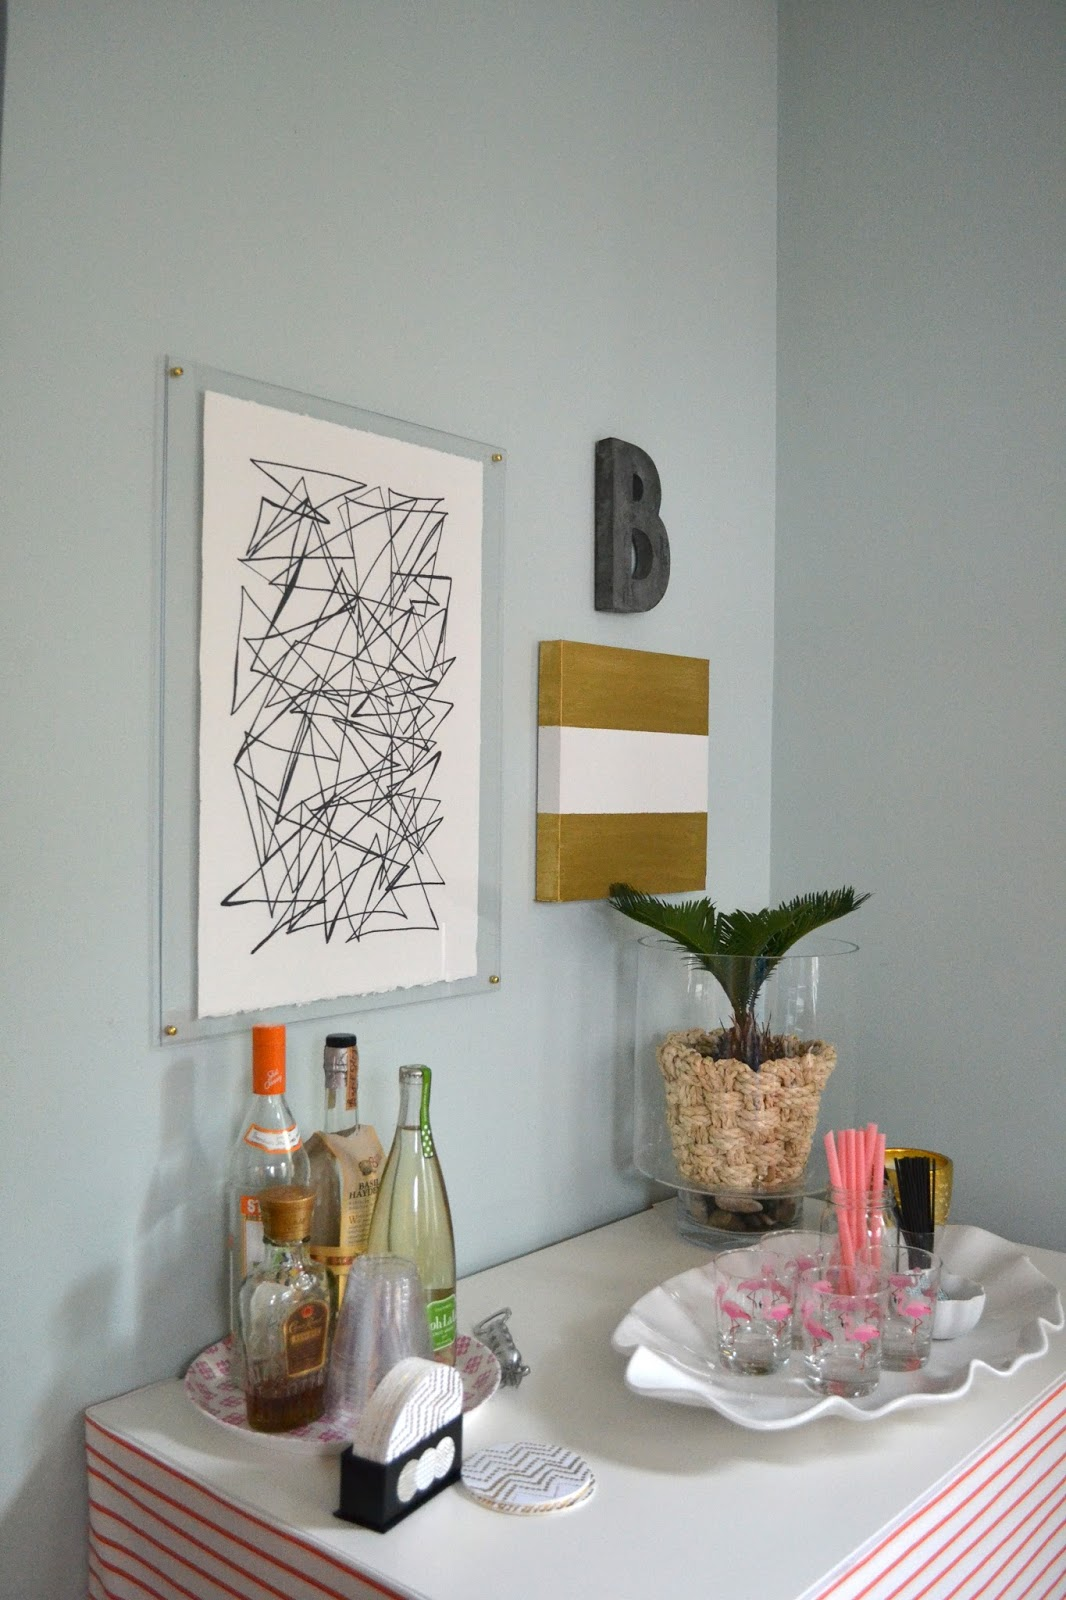 Ethan Allen Wall Art knock off ethan allen art (scribbling) in an acrylic frame